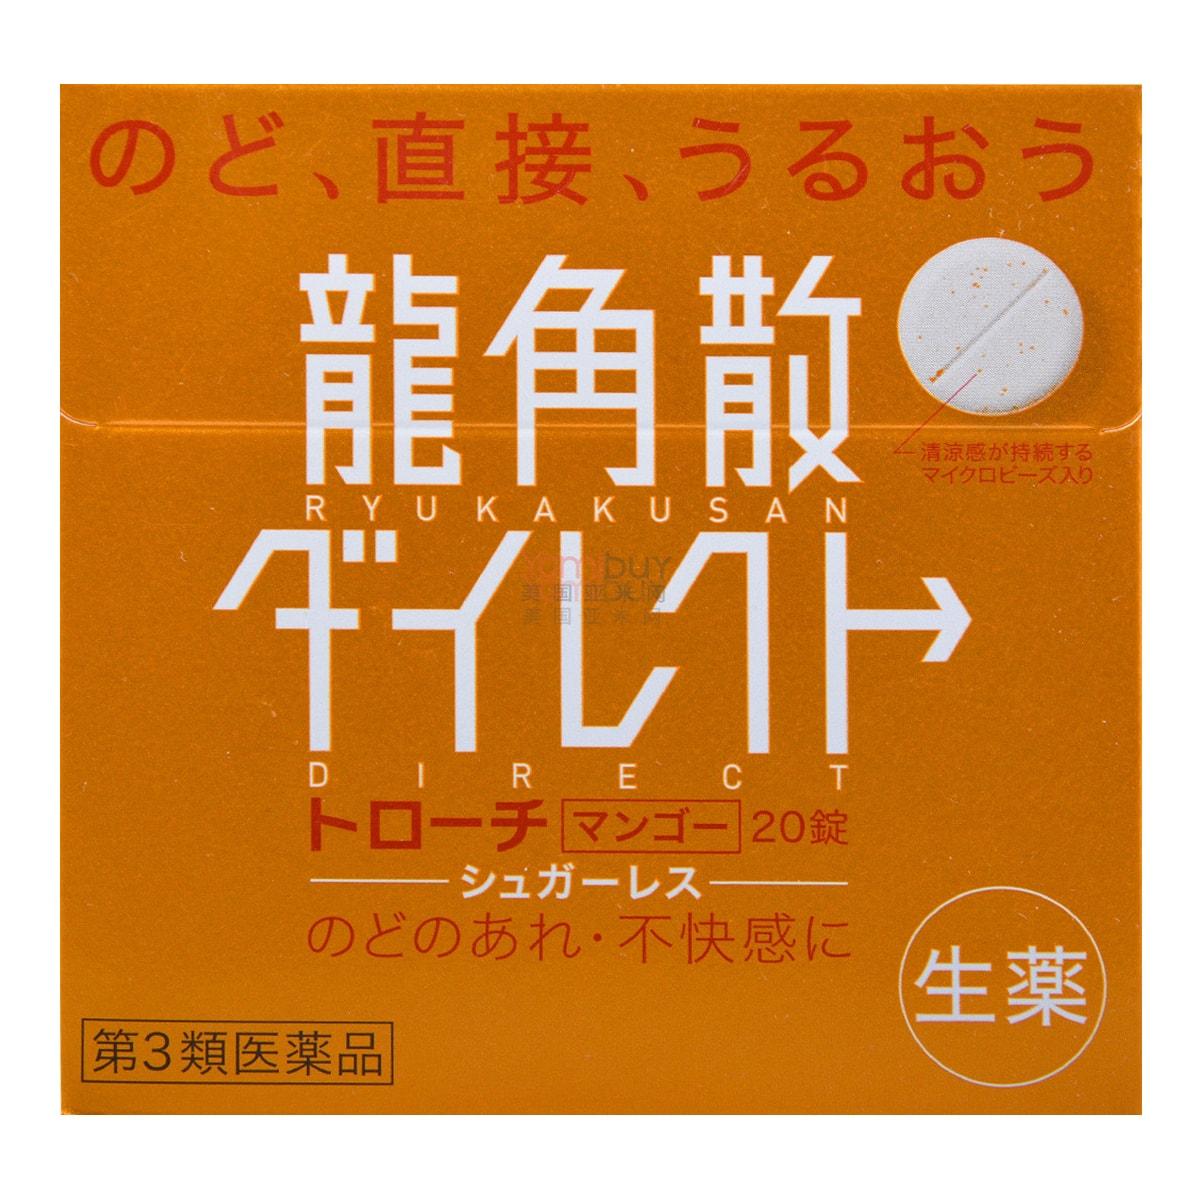 RYUKAKUSAN Direct Lozenge Mango Flavor 20tablets